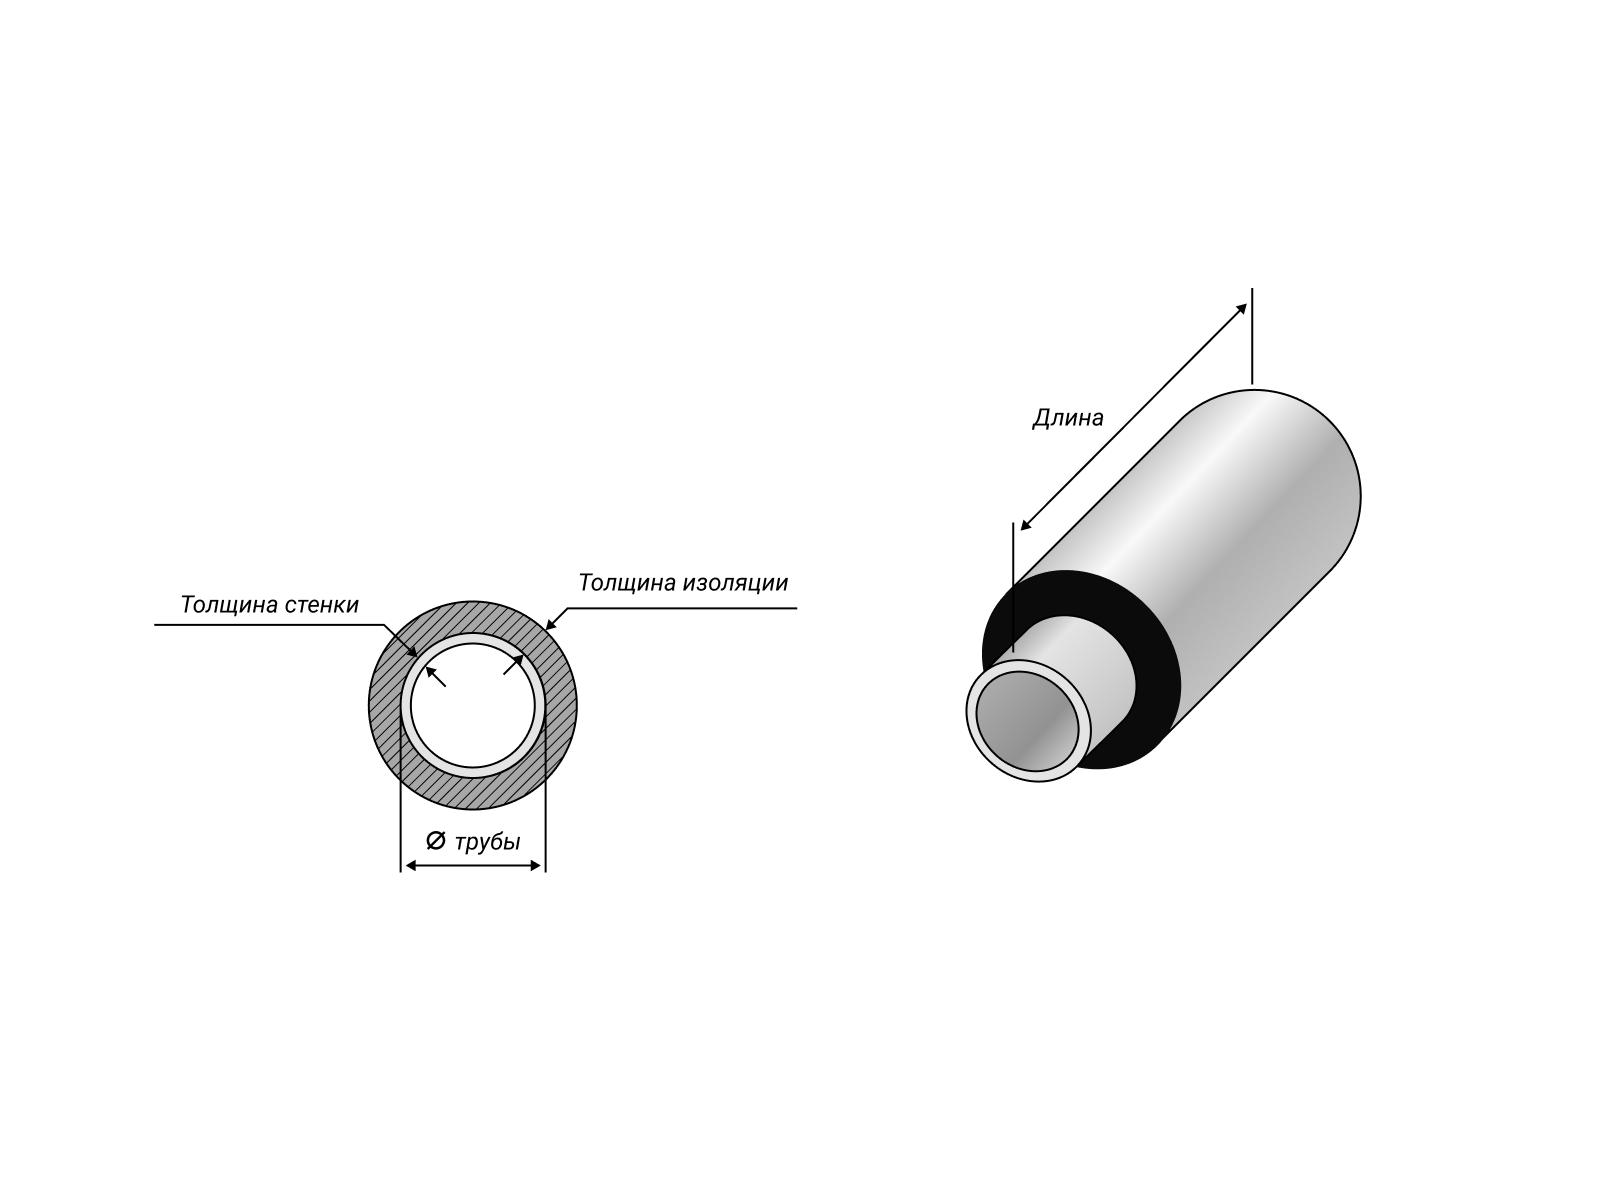 Труба Ст 32-3 ППУ-ОЦ 6000